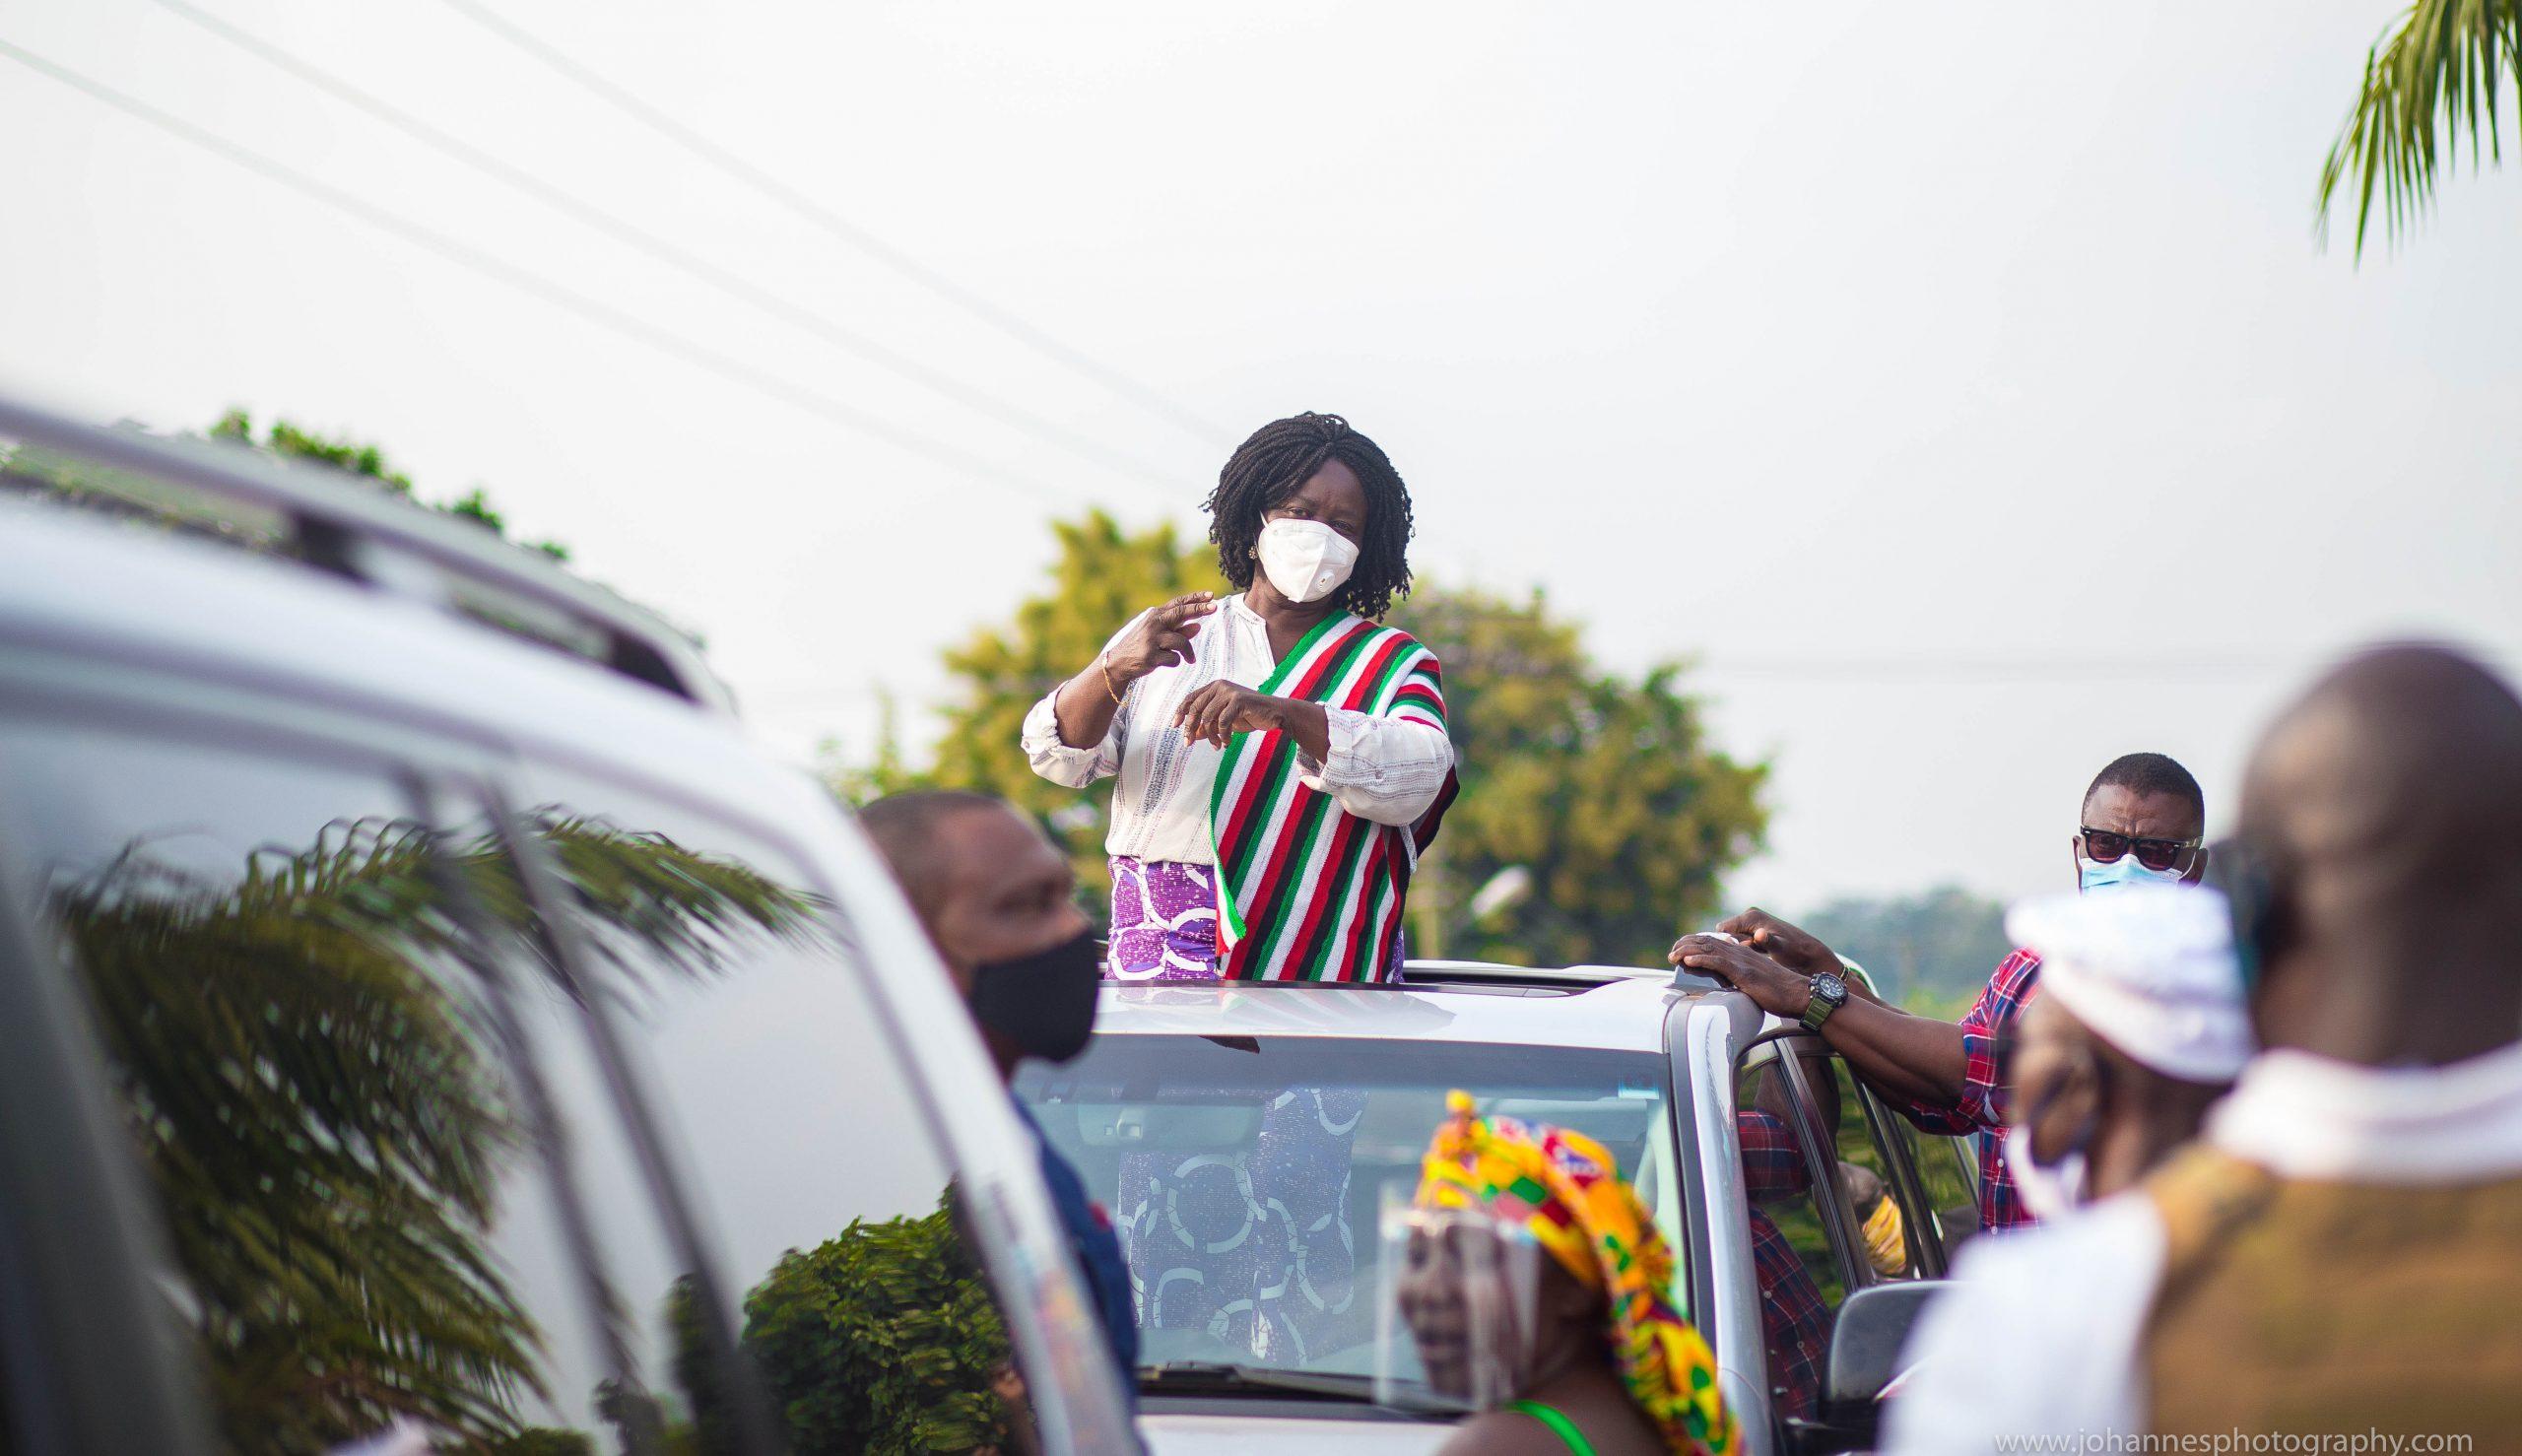 Mahama Is Committed To Growing Ghana's Economy And Improving Livelihoods – Naana Opoku Agyemang. 1